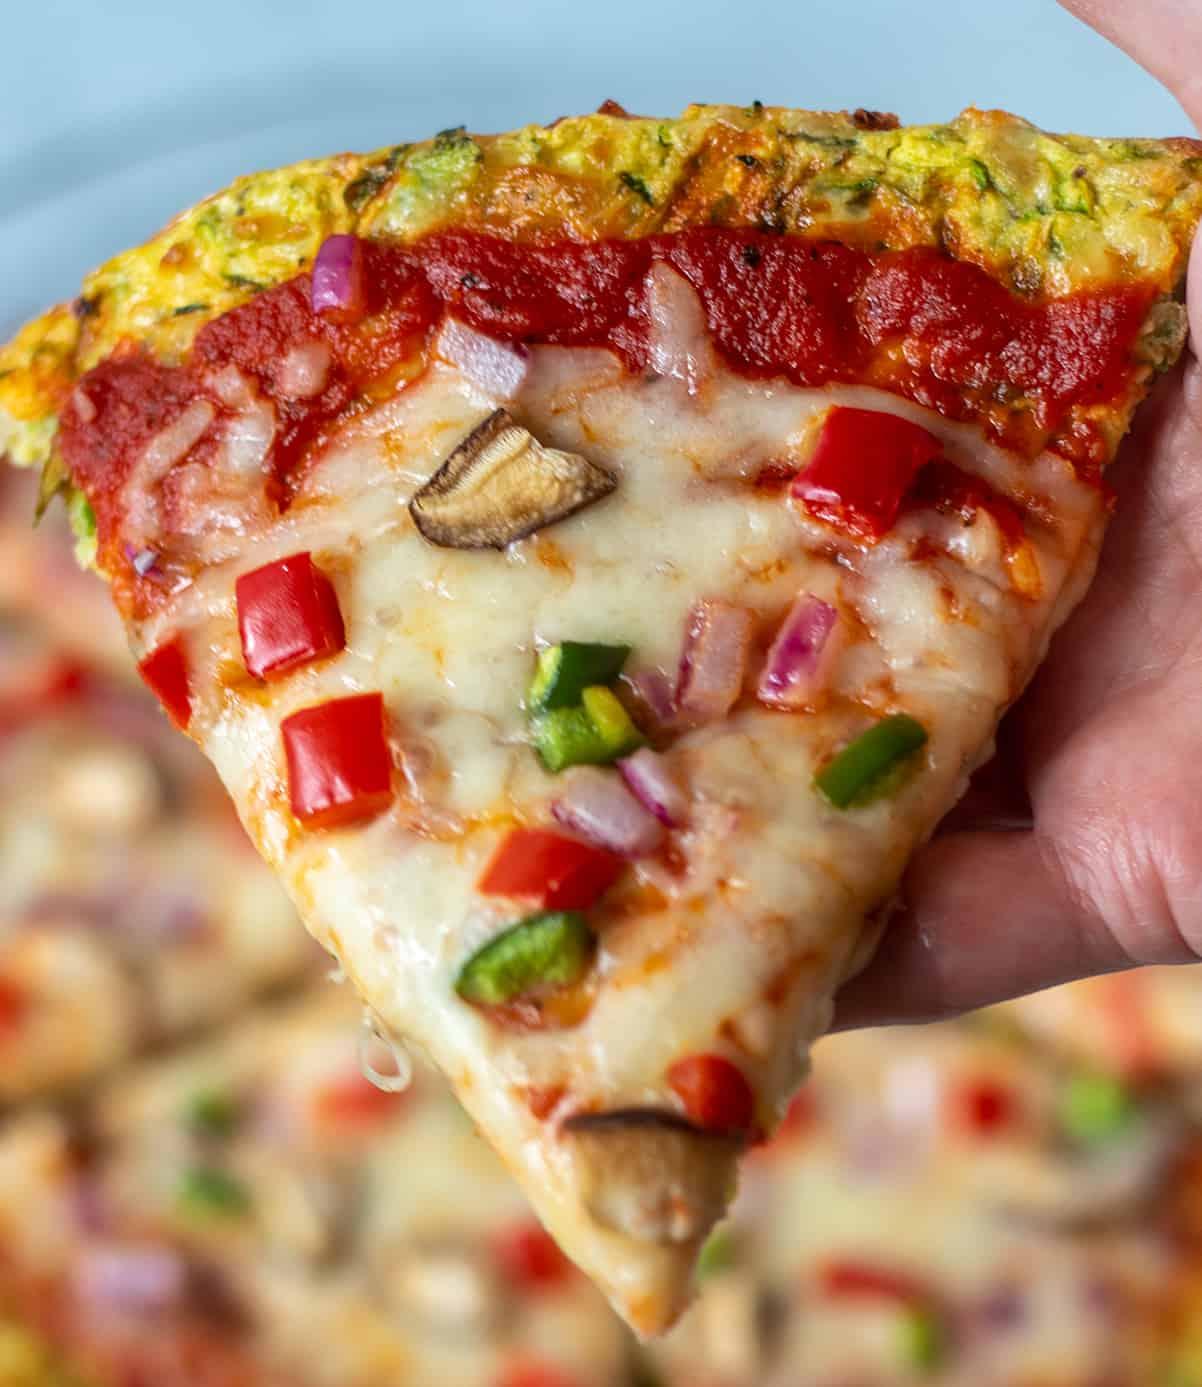 Holding slice of zucchini pizza crust in hand